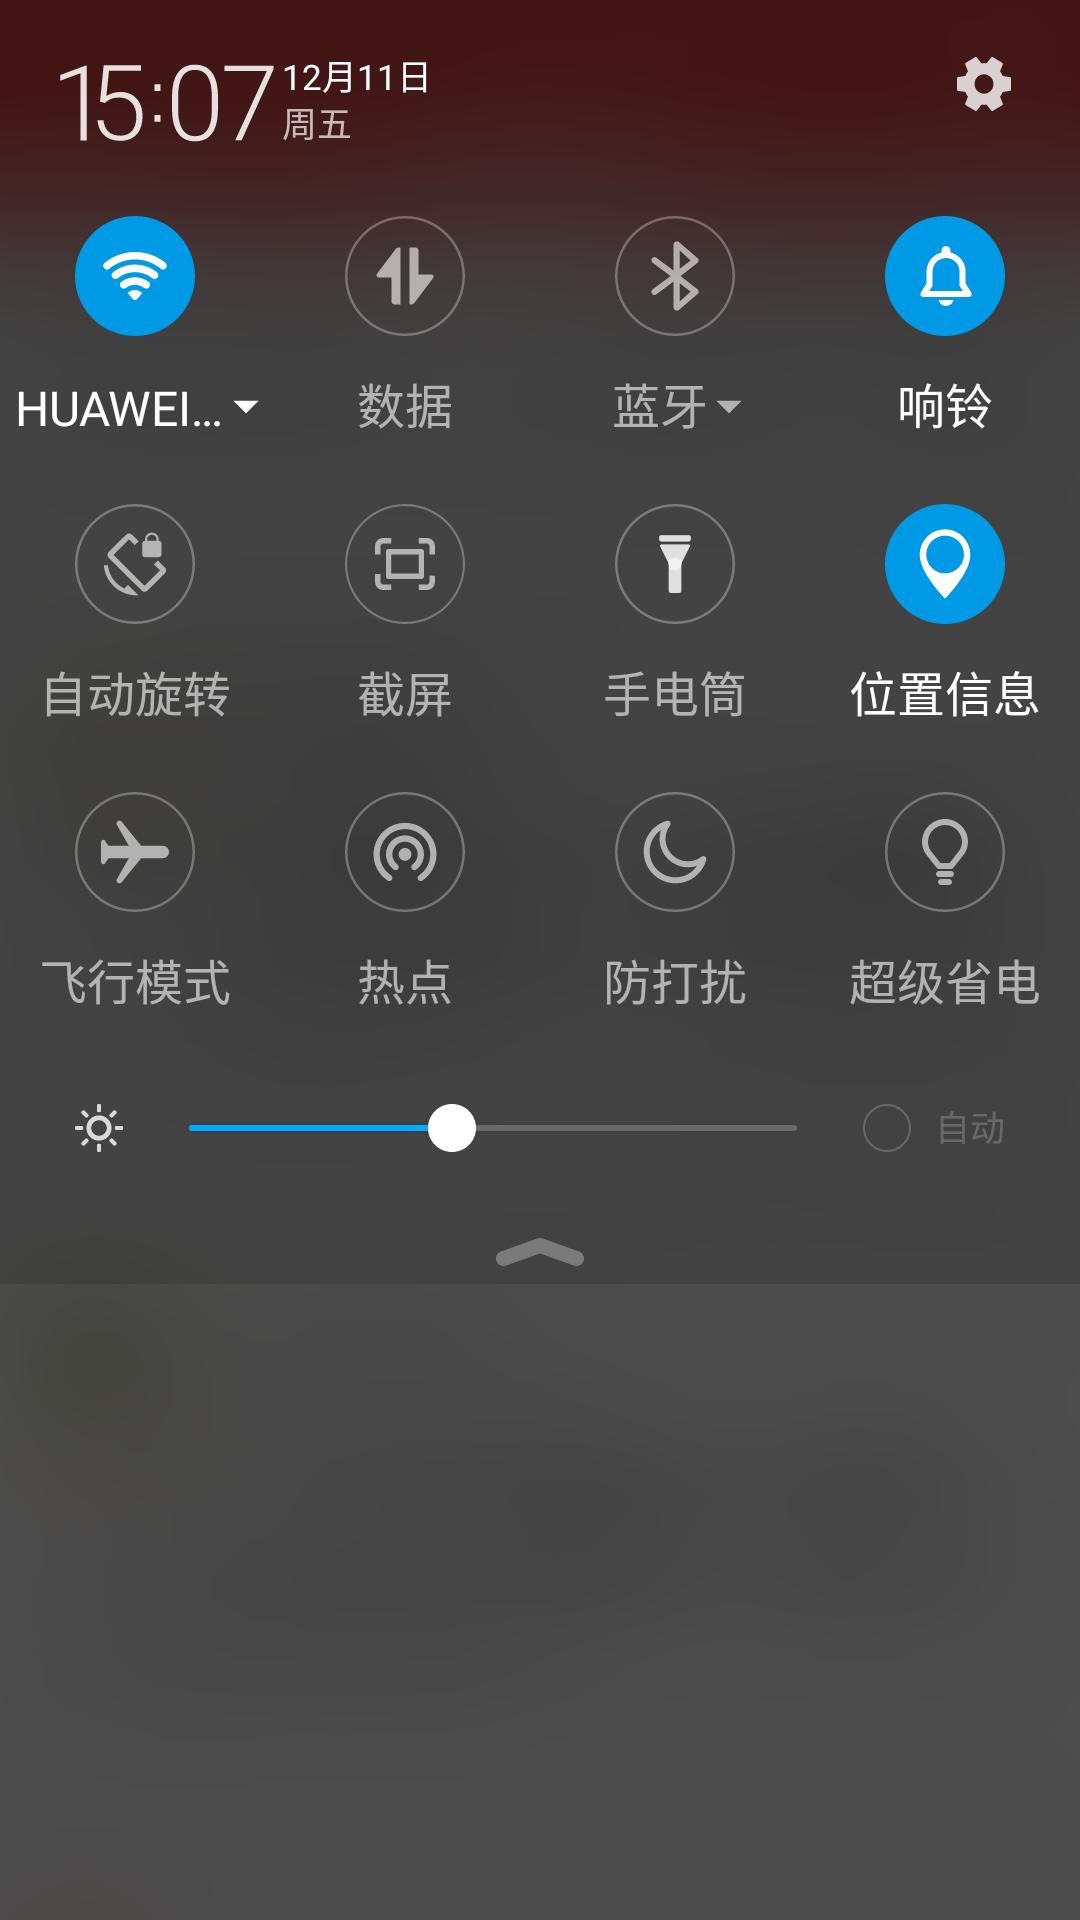 Screenshot_2015-12-11-15-07-32.png